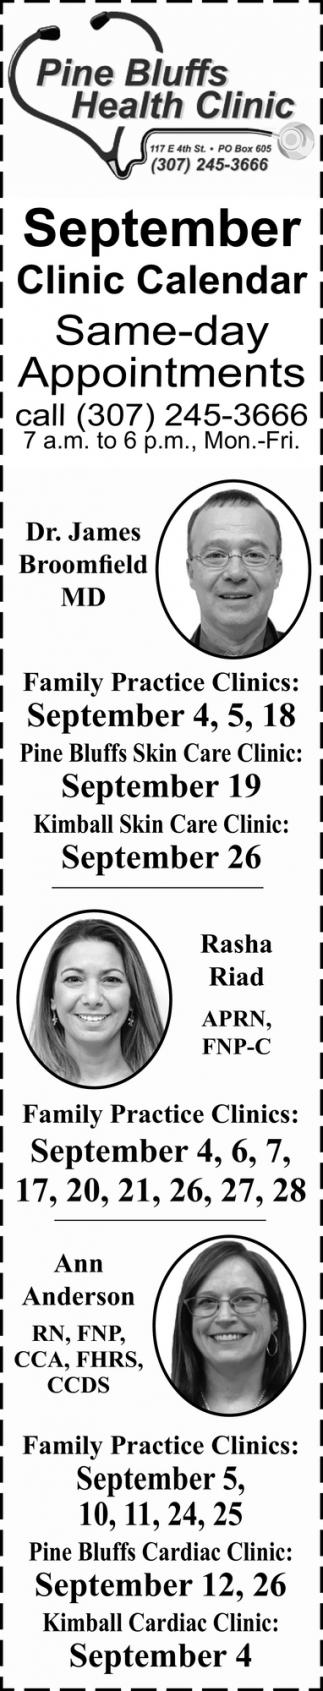 September Clinic Calendar